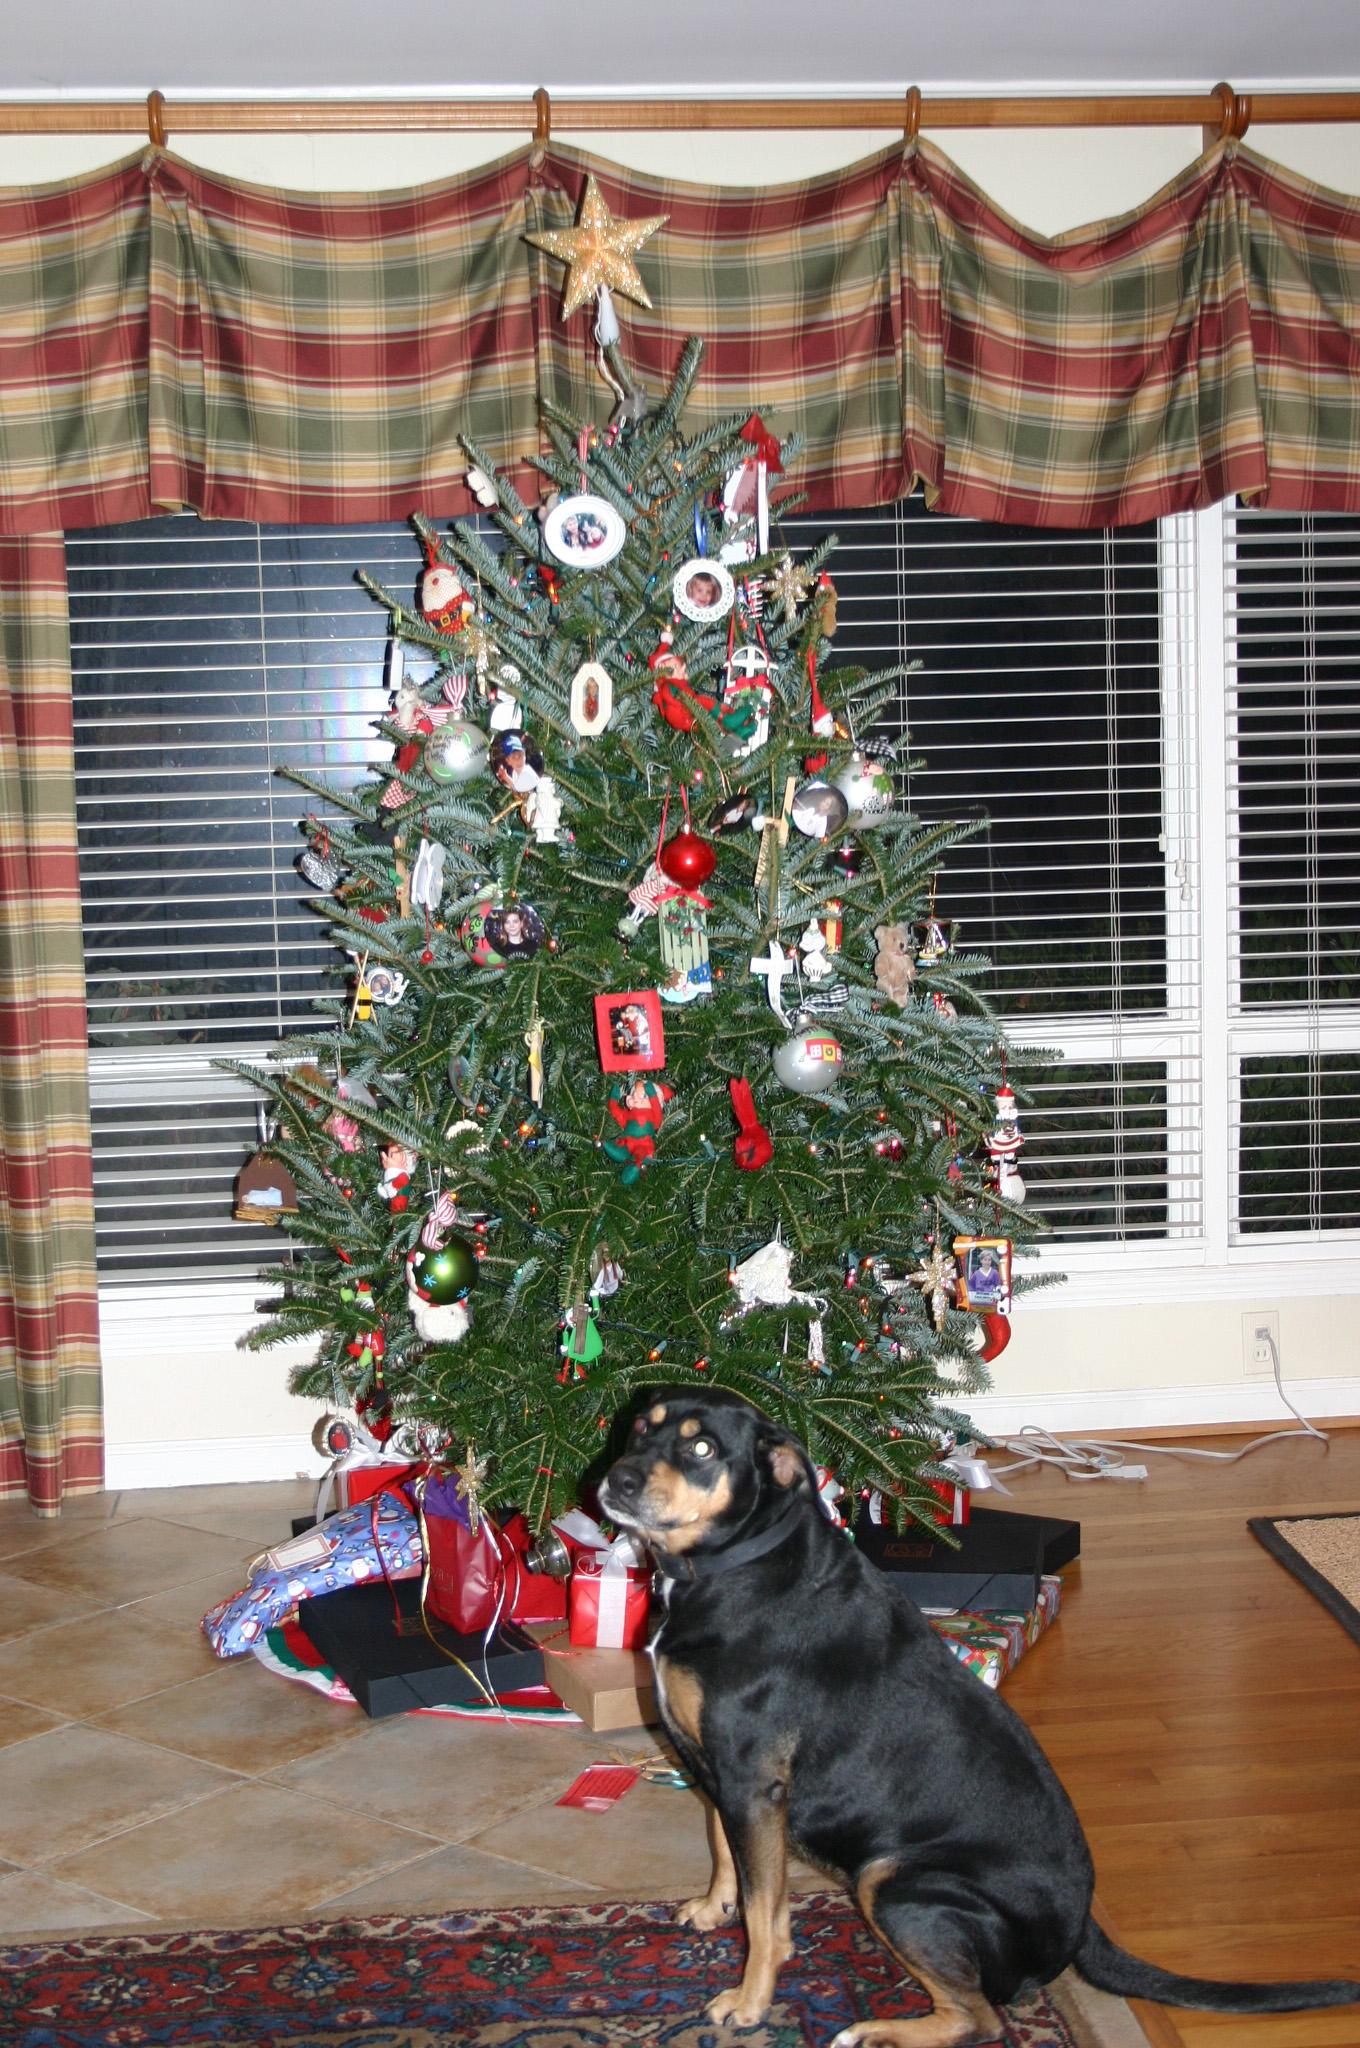 even dogs enjoy Christmas!